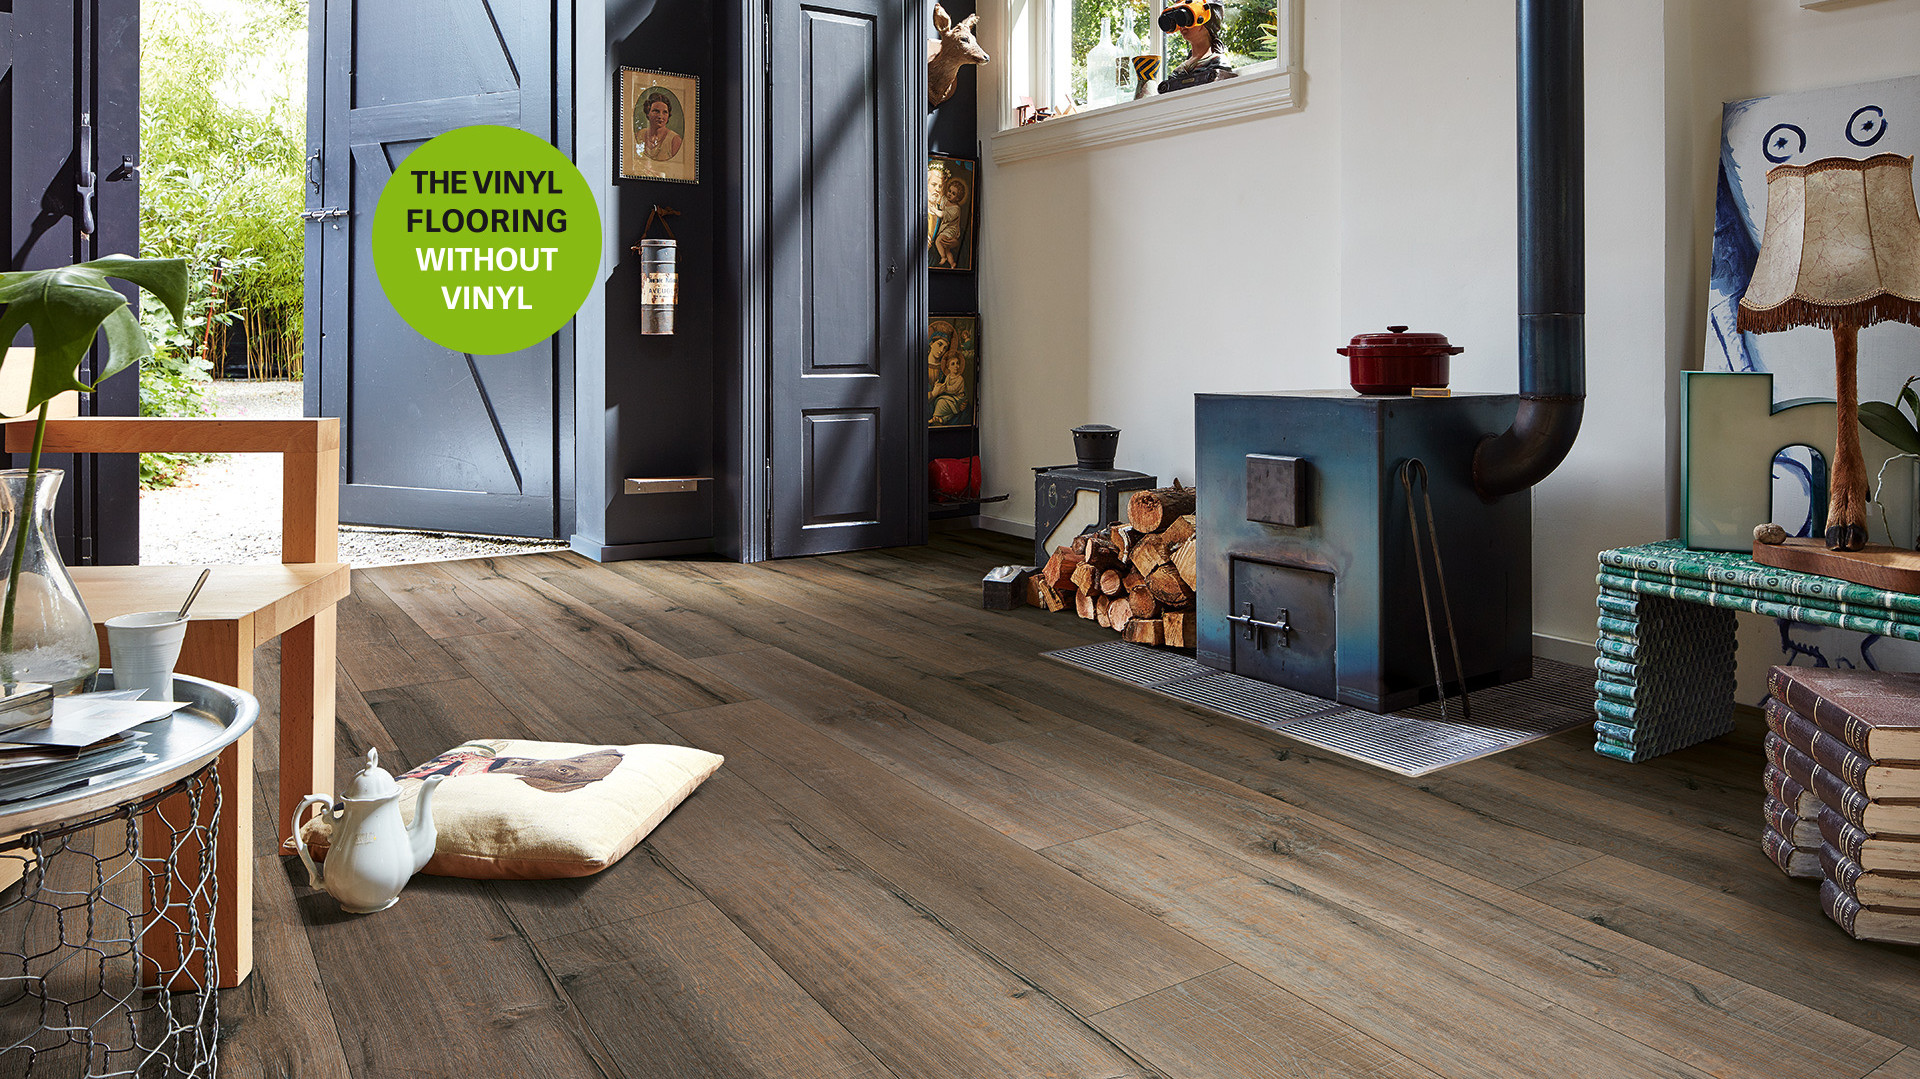 Vinyl flooring without vinyl